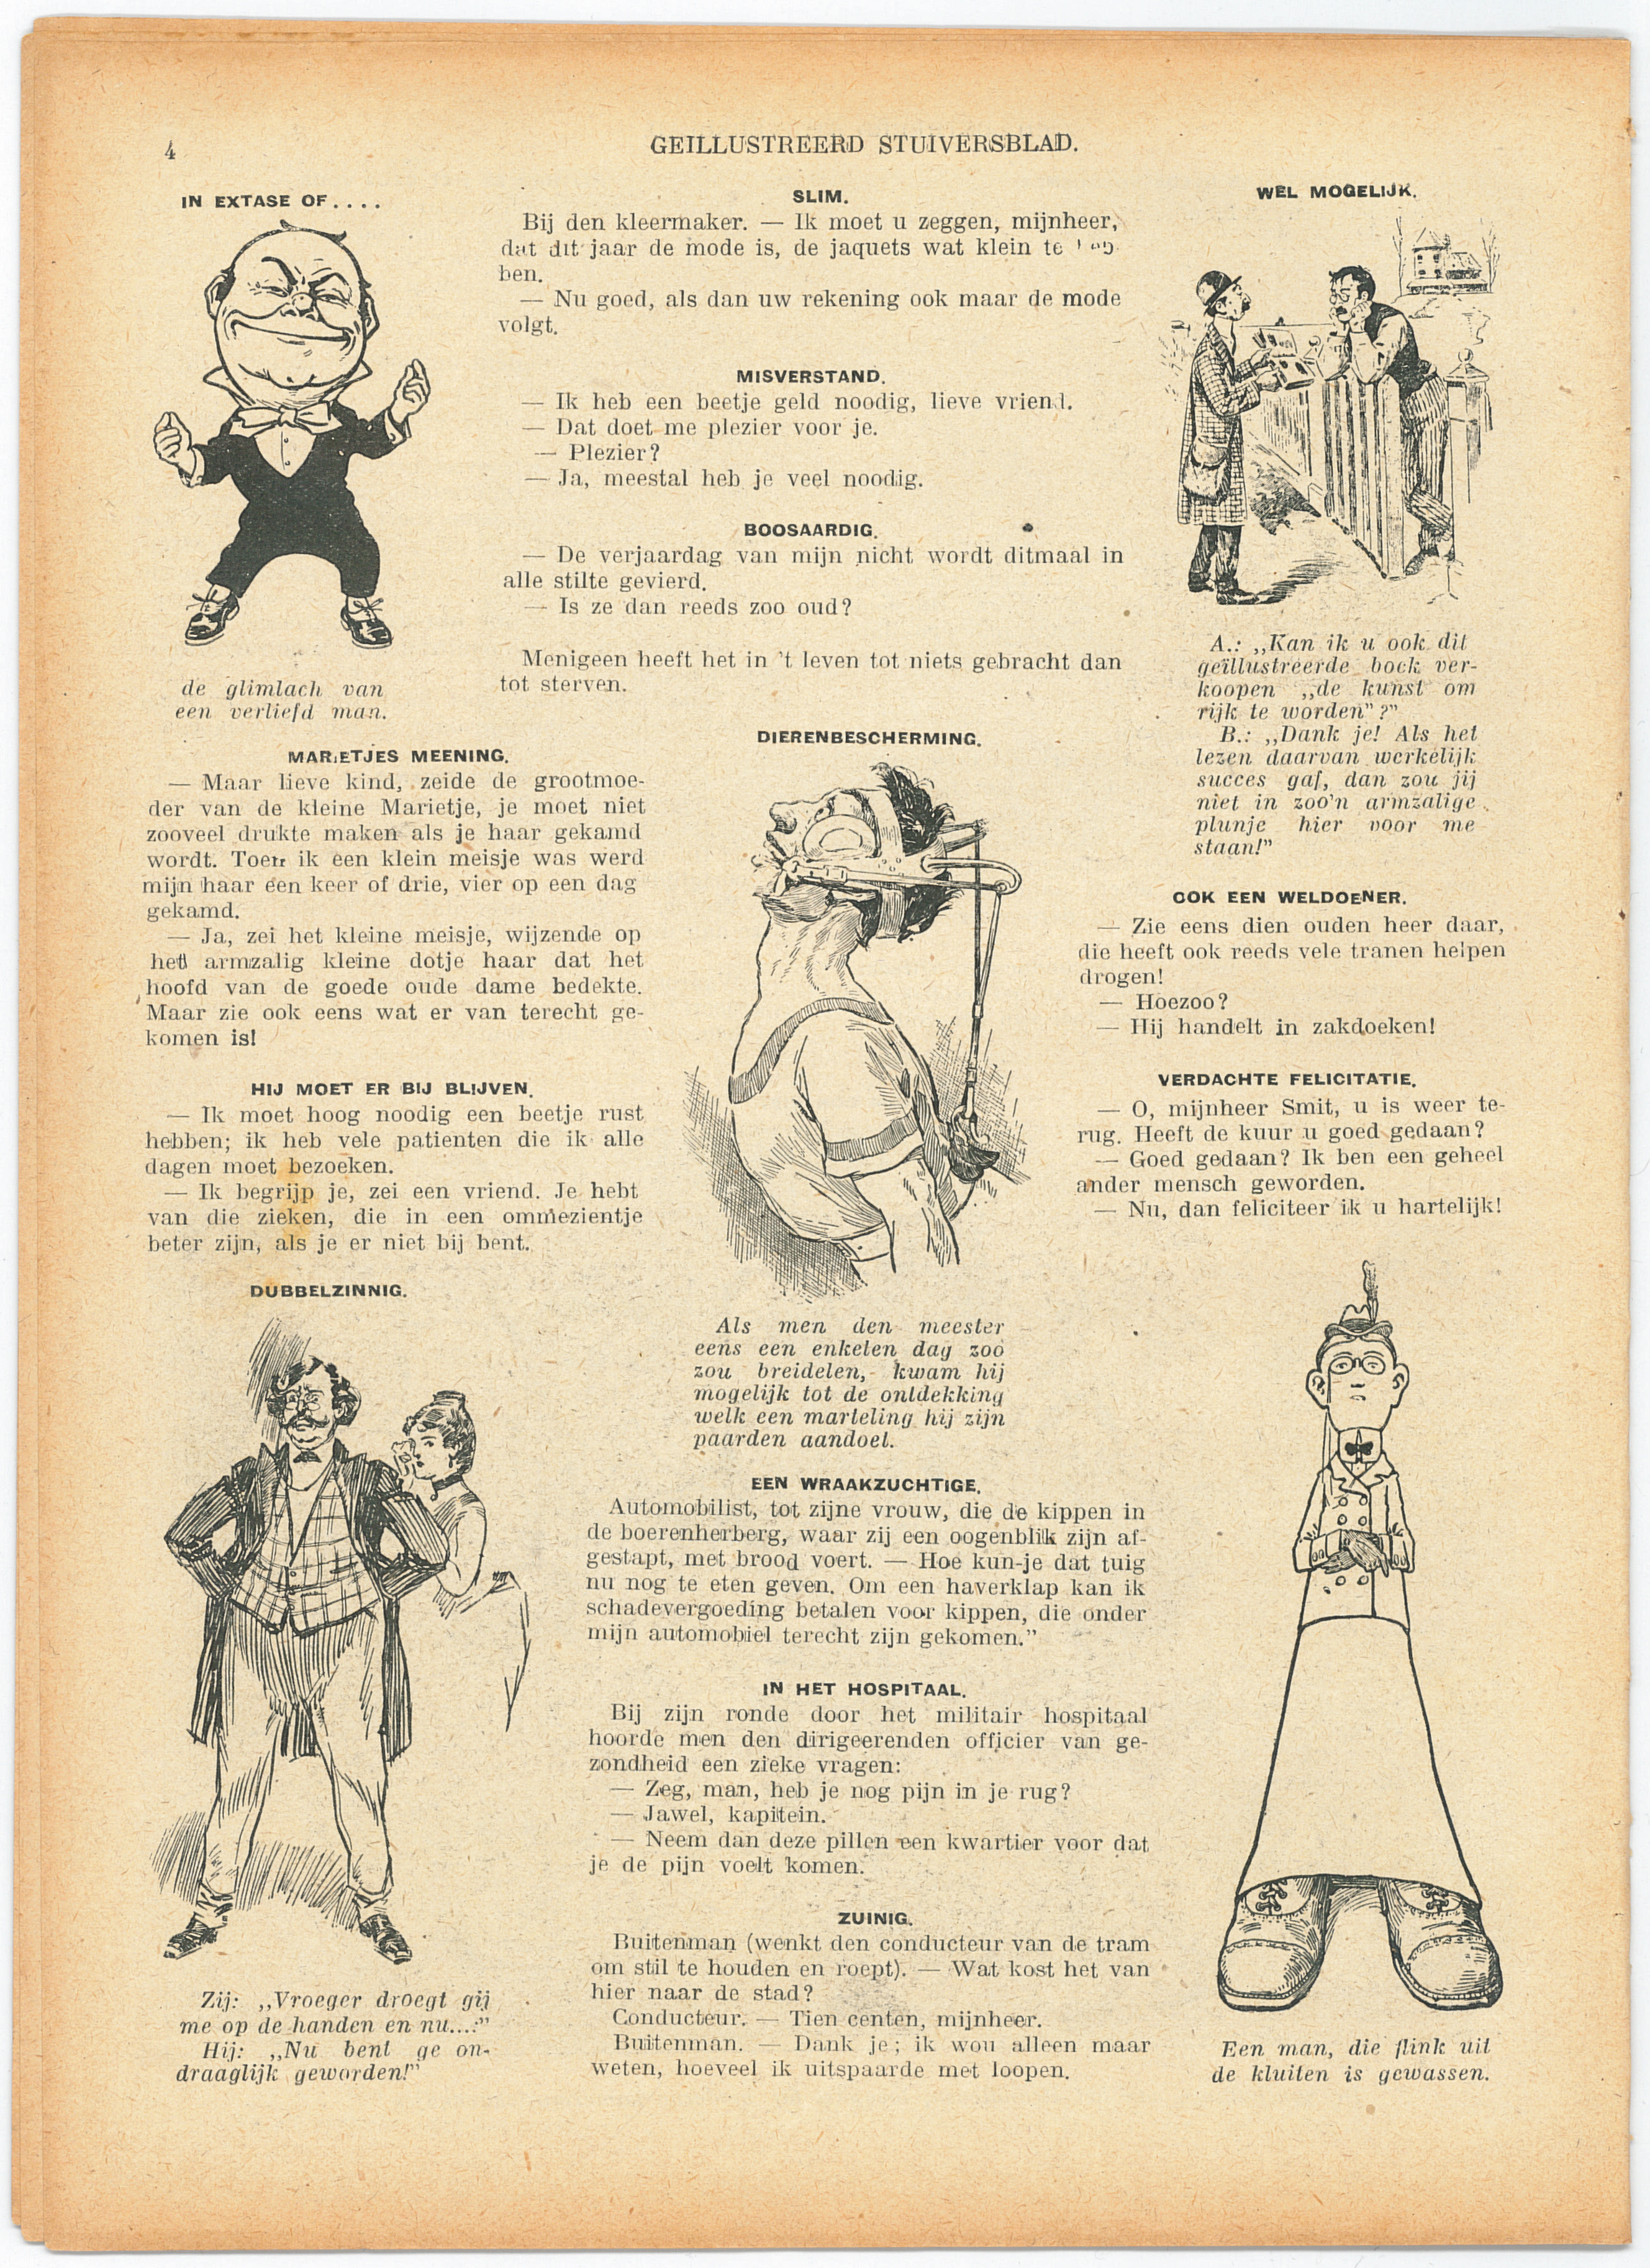 File Stuivers Blad No27 4 Juli 1915 Pagina 4 Jpg Wikimedia Commons